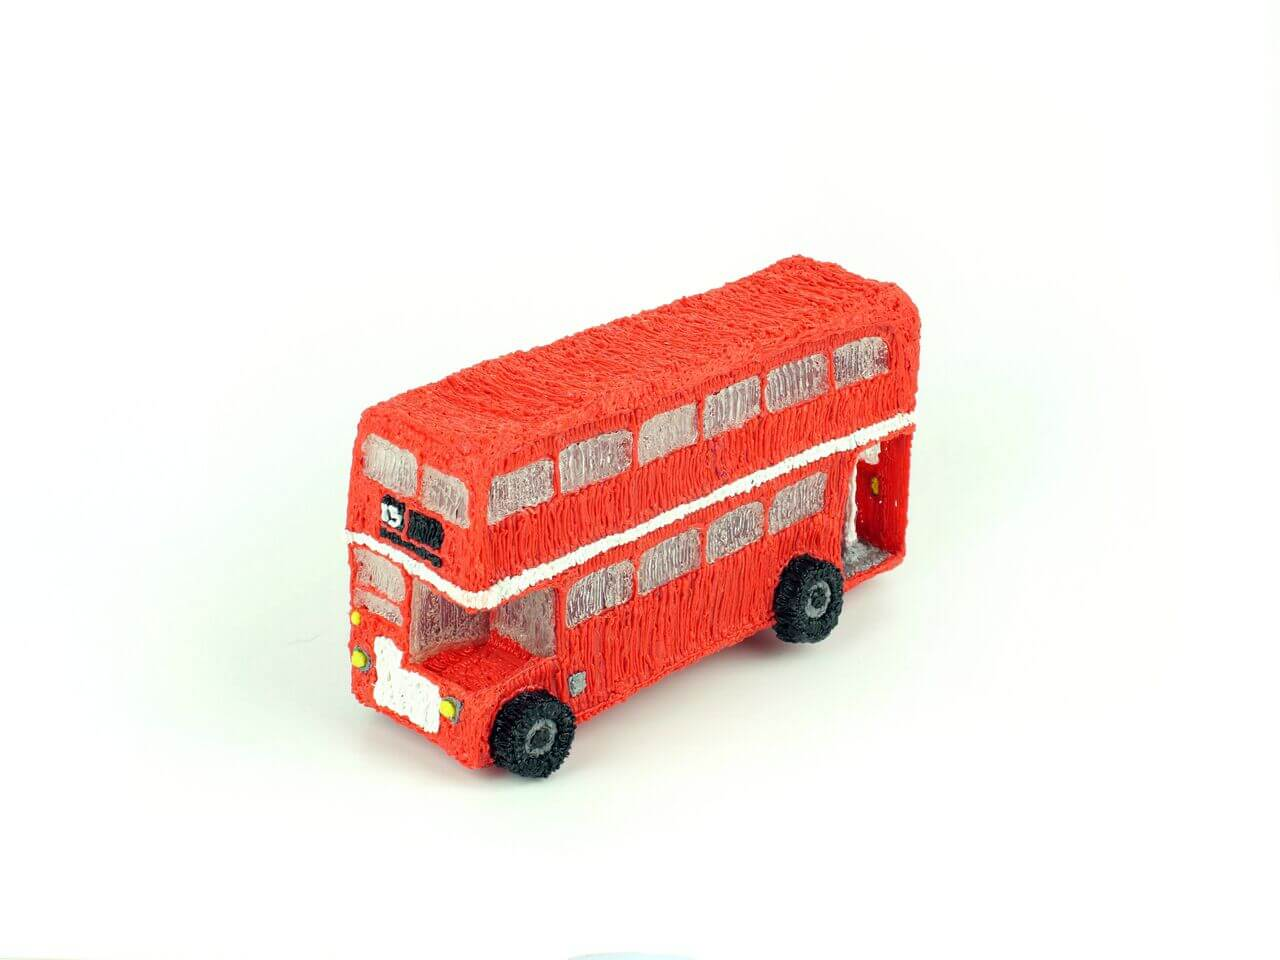 autocar 3doodler 2.0